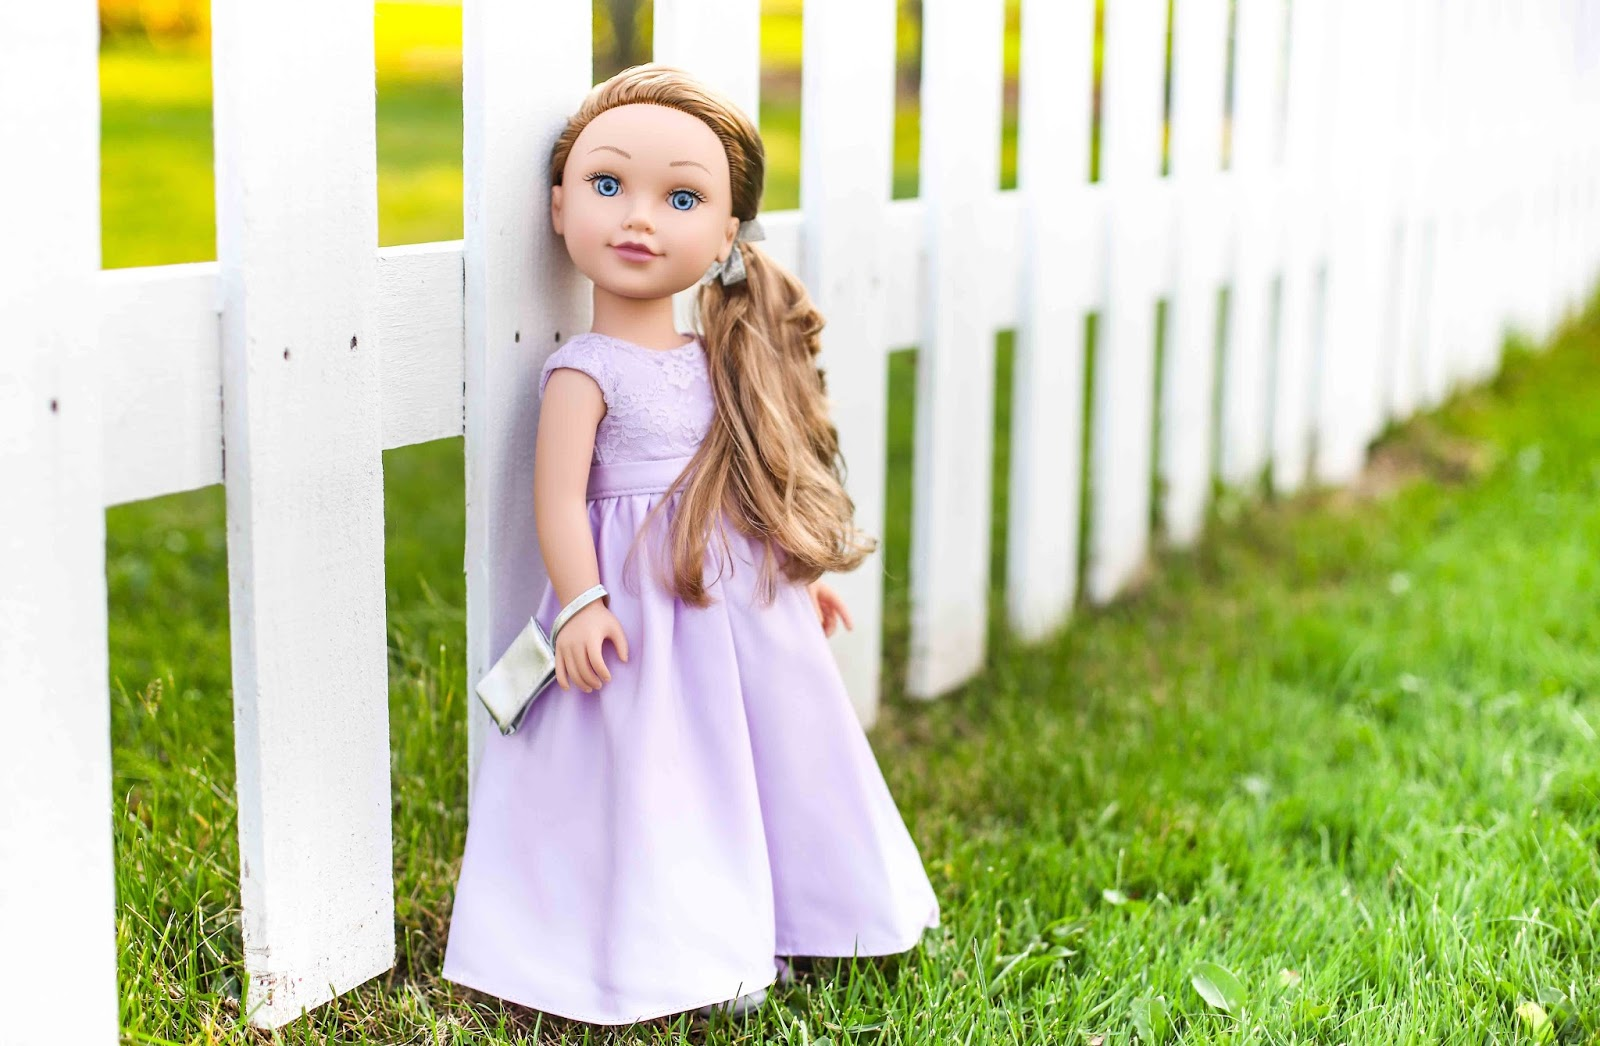 Toys R Us Journey Girls : My journey girls dolls adventures: journey girls limited edition